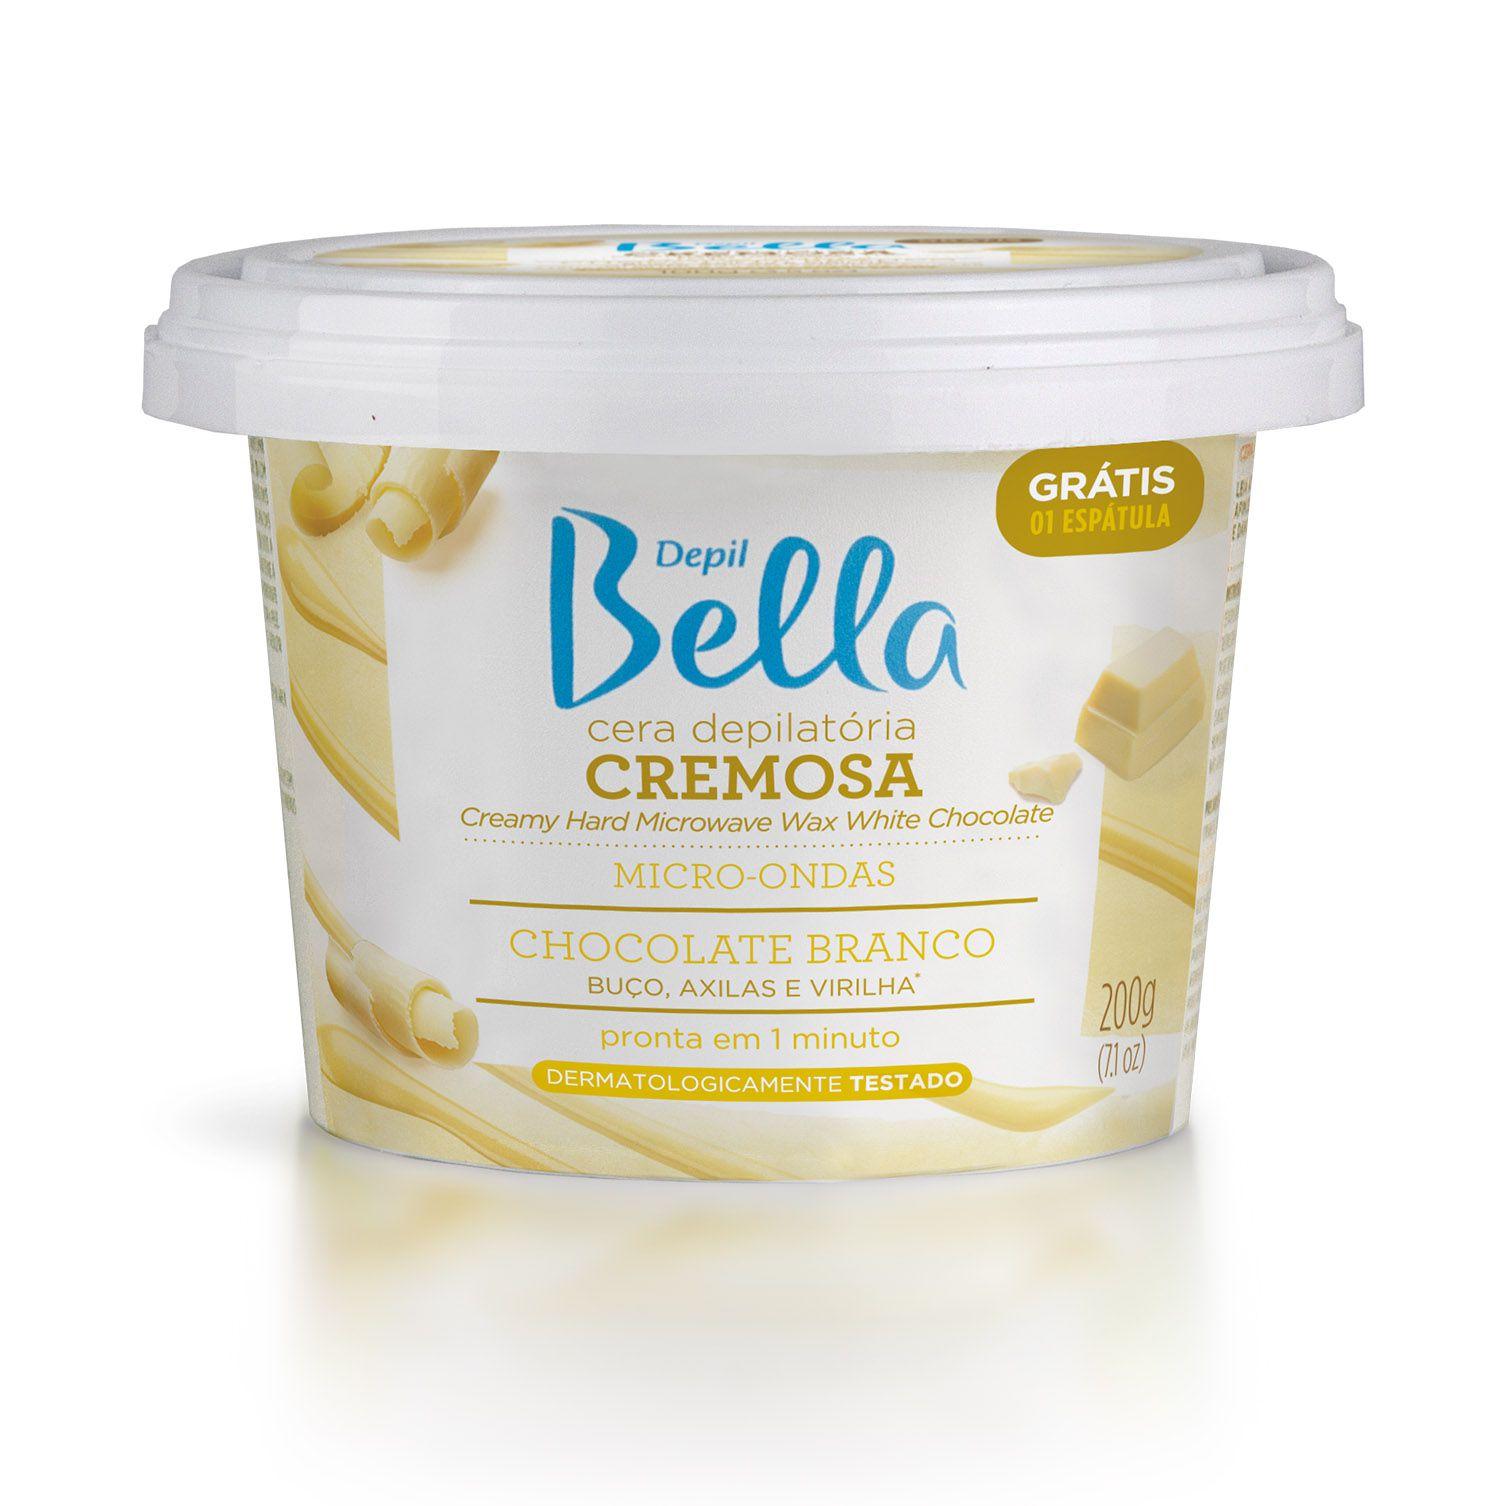 CERA MICRO-ONDAS CREMOSA CHOCOLATE BRANCO DEPIL BELLA  200G